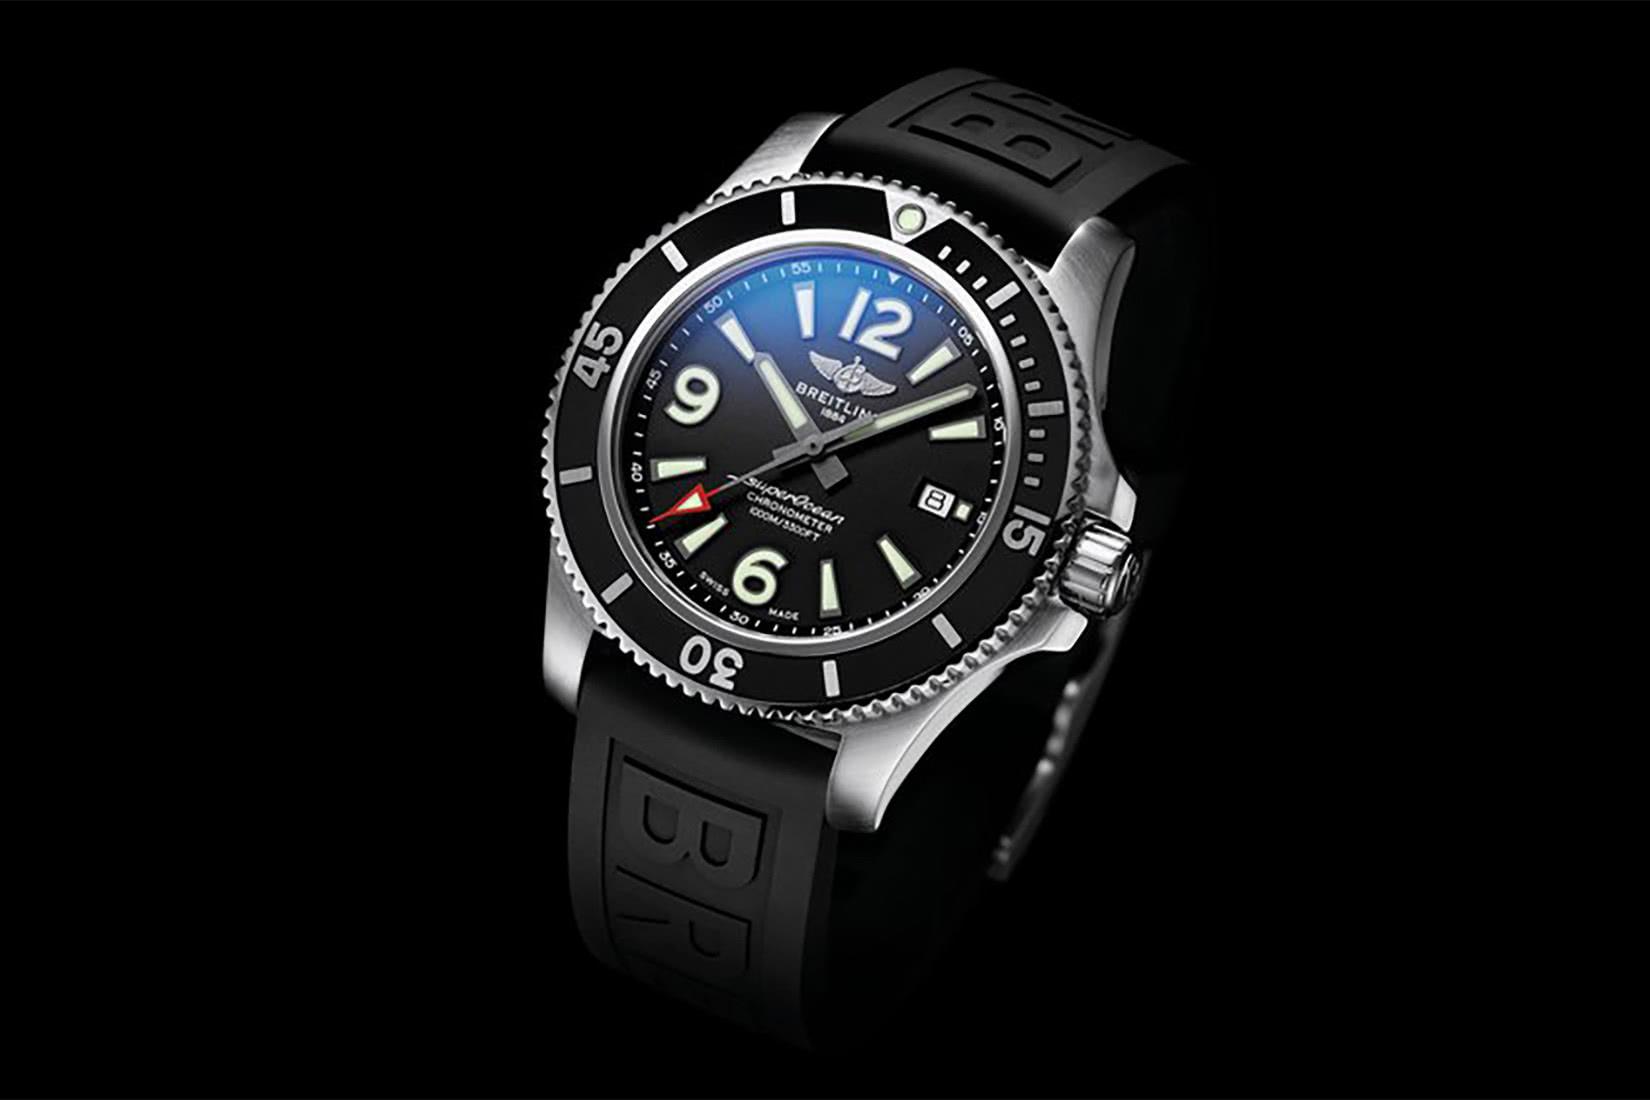 eBay luxury watch authenticity guarantee Breitling Superocean Moonwatch review - Luxe Digital